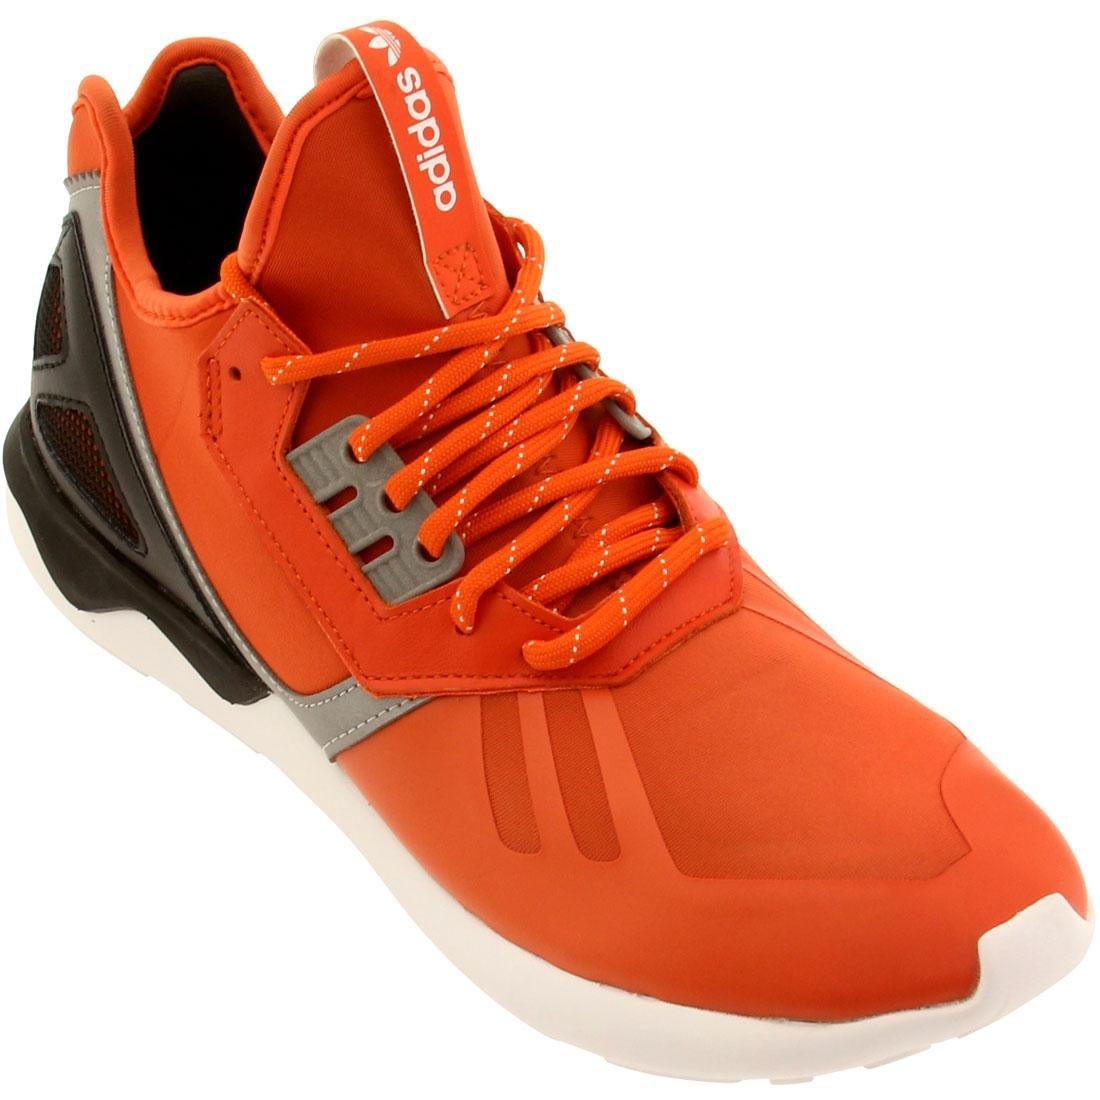 Orange   Orange-noir adidas Tubular Runner - Orange Orange-Noir, 8 D Us